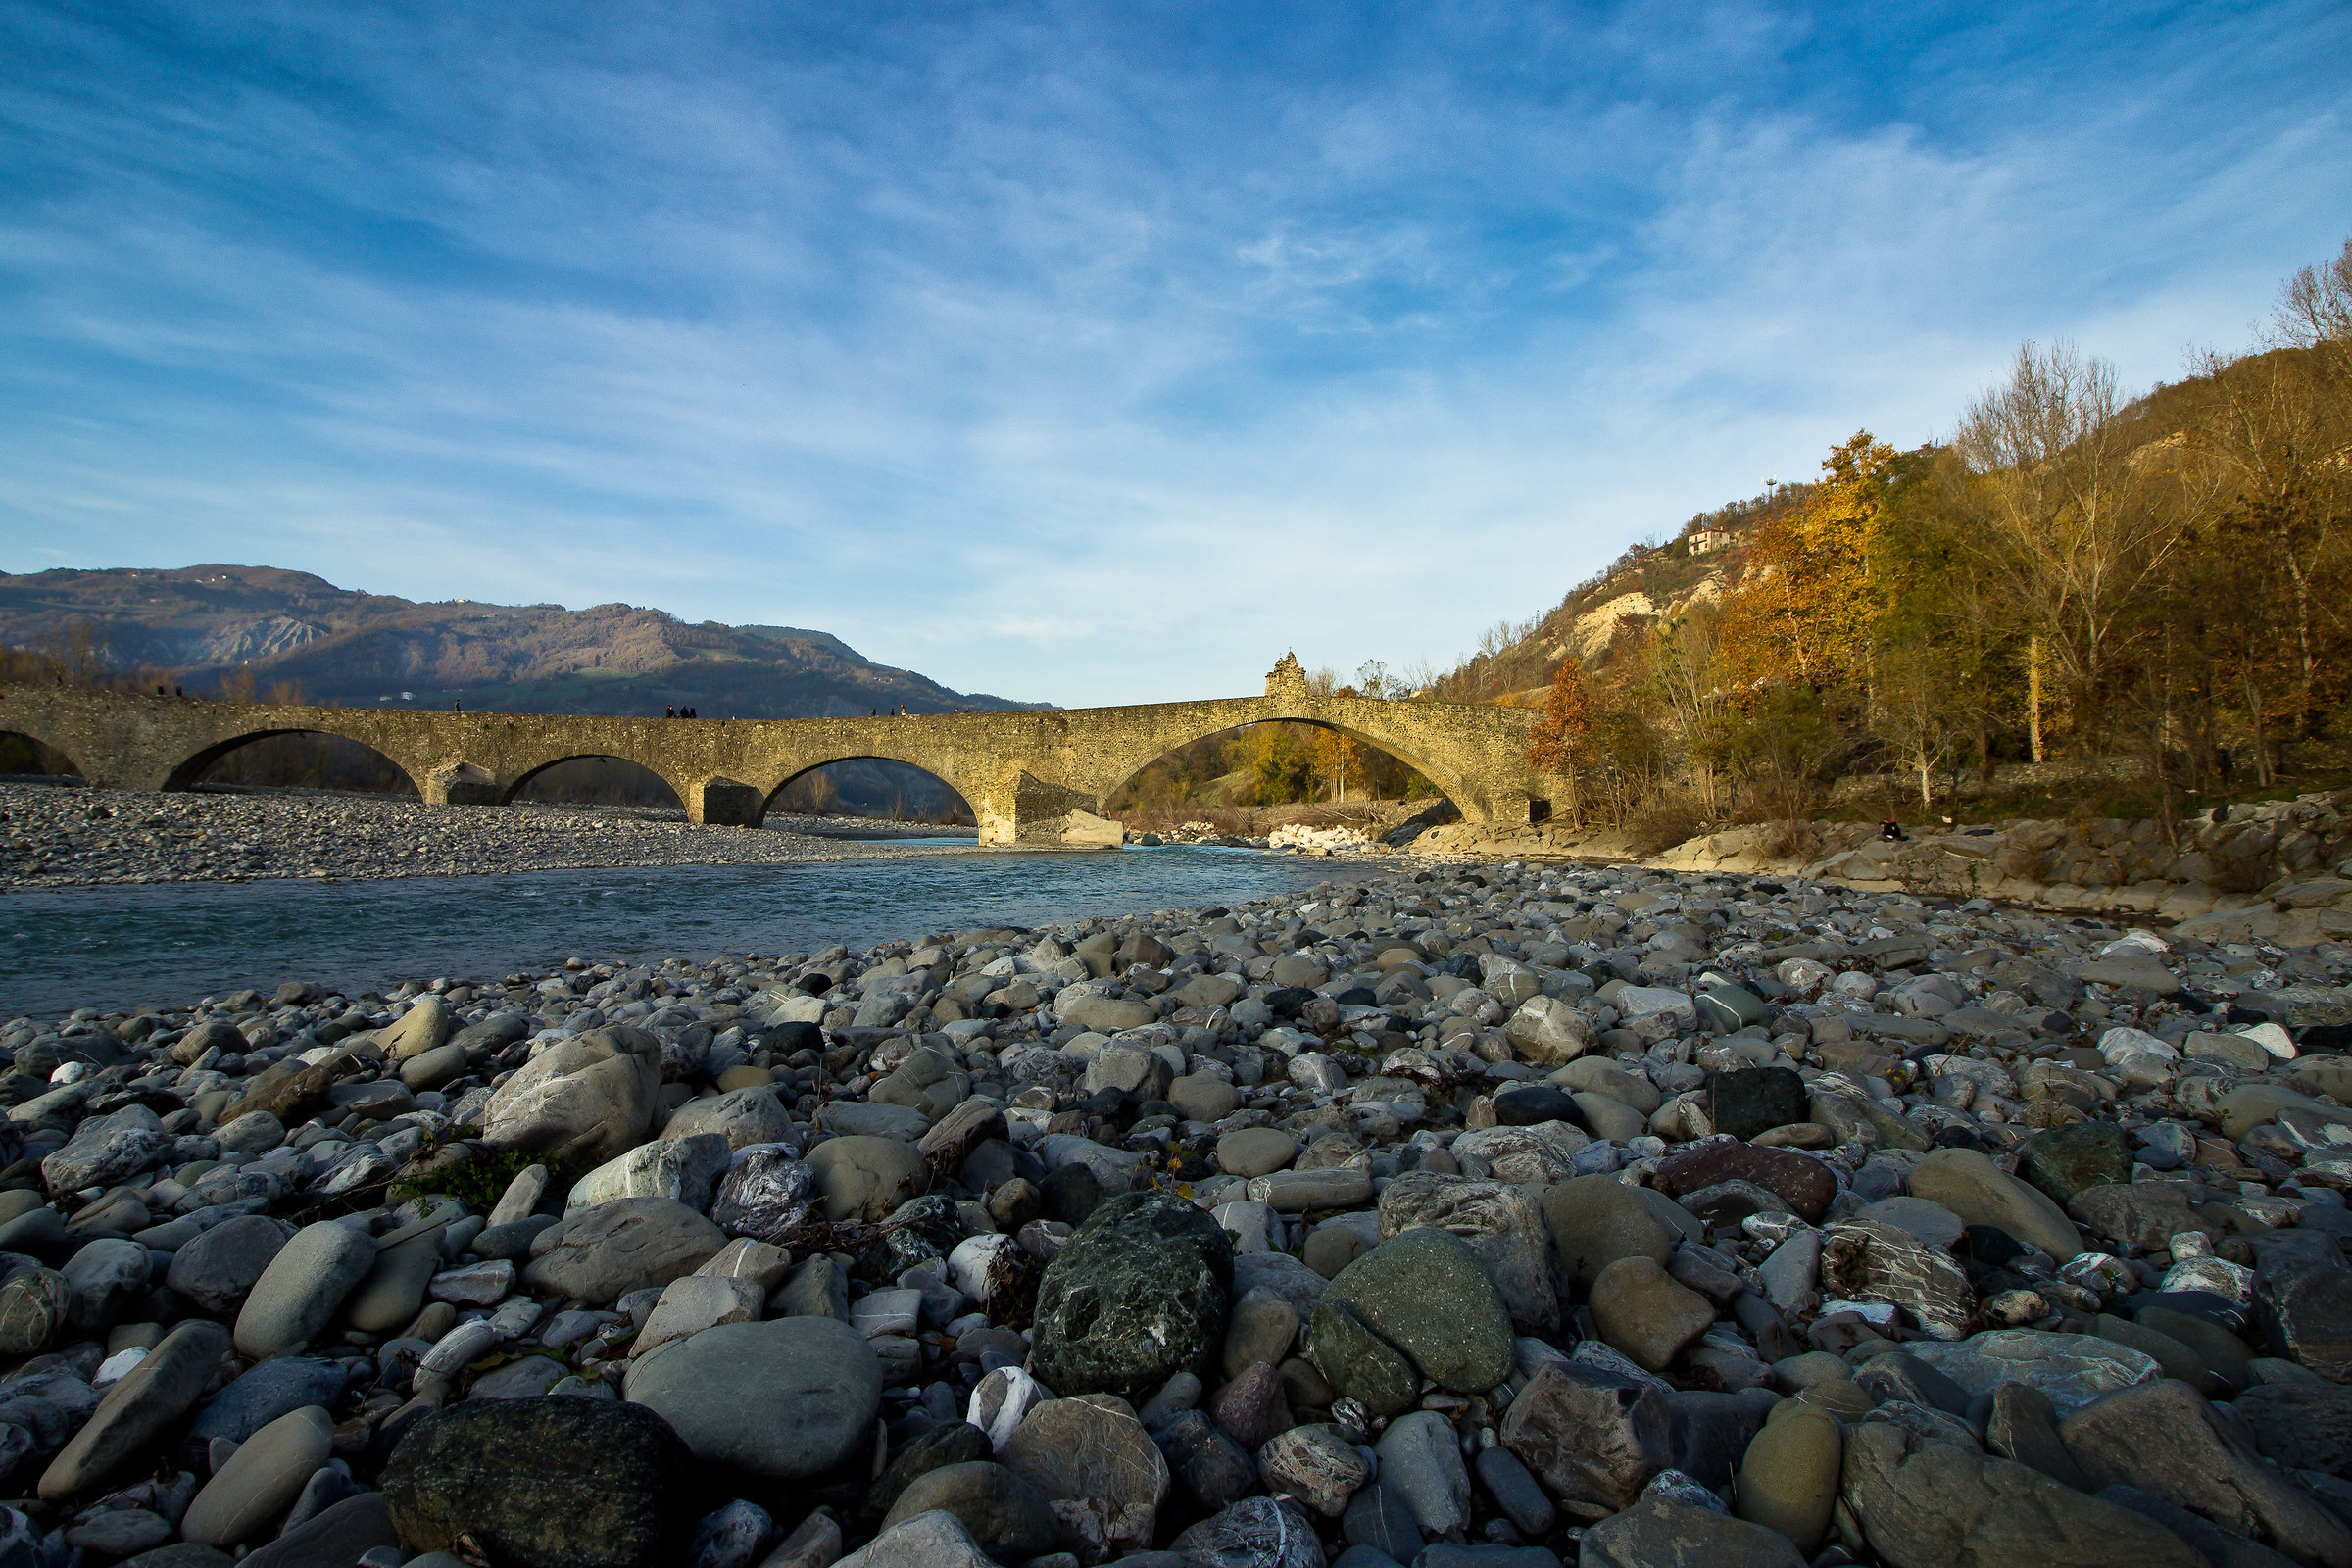 hunchback bridge away...